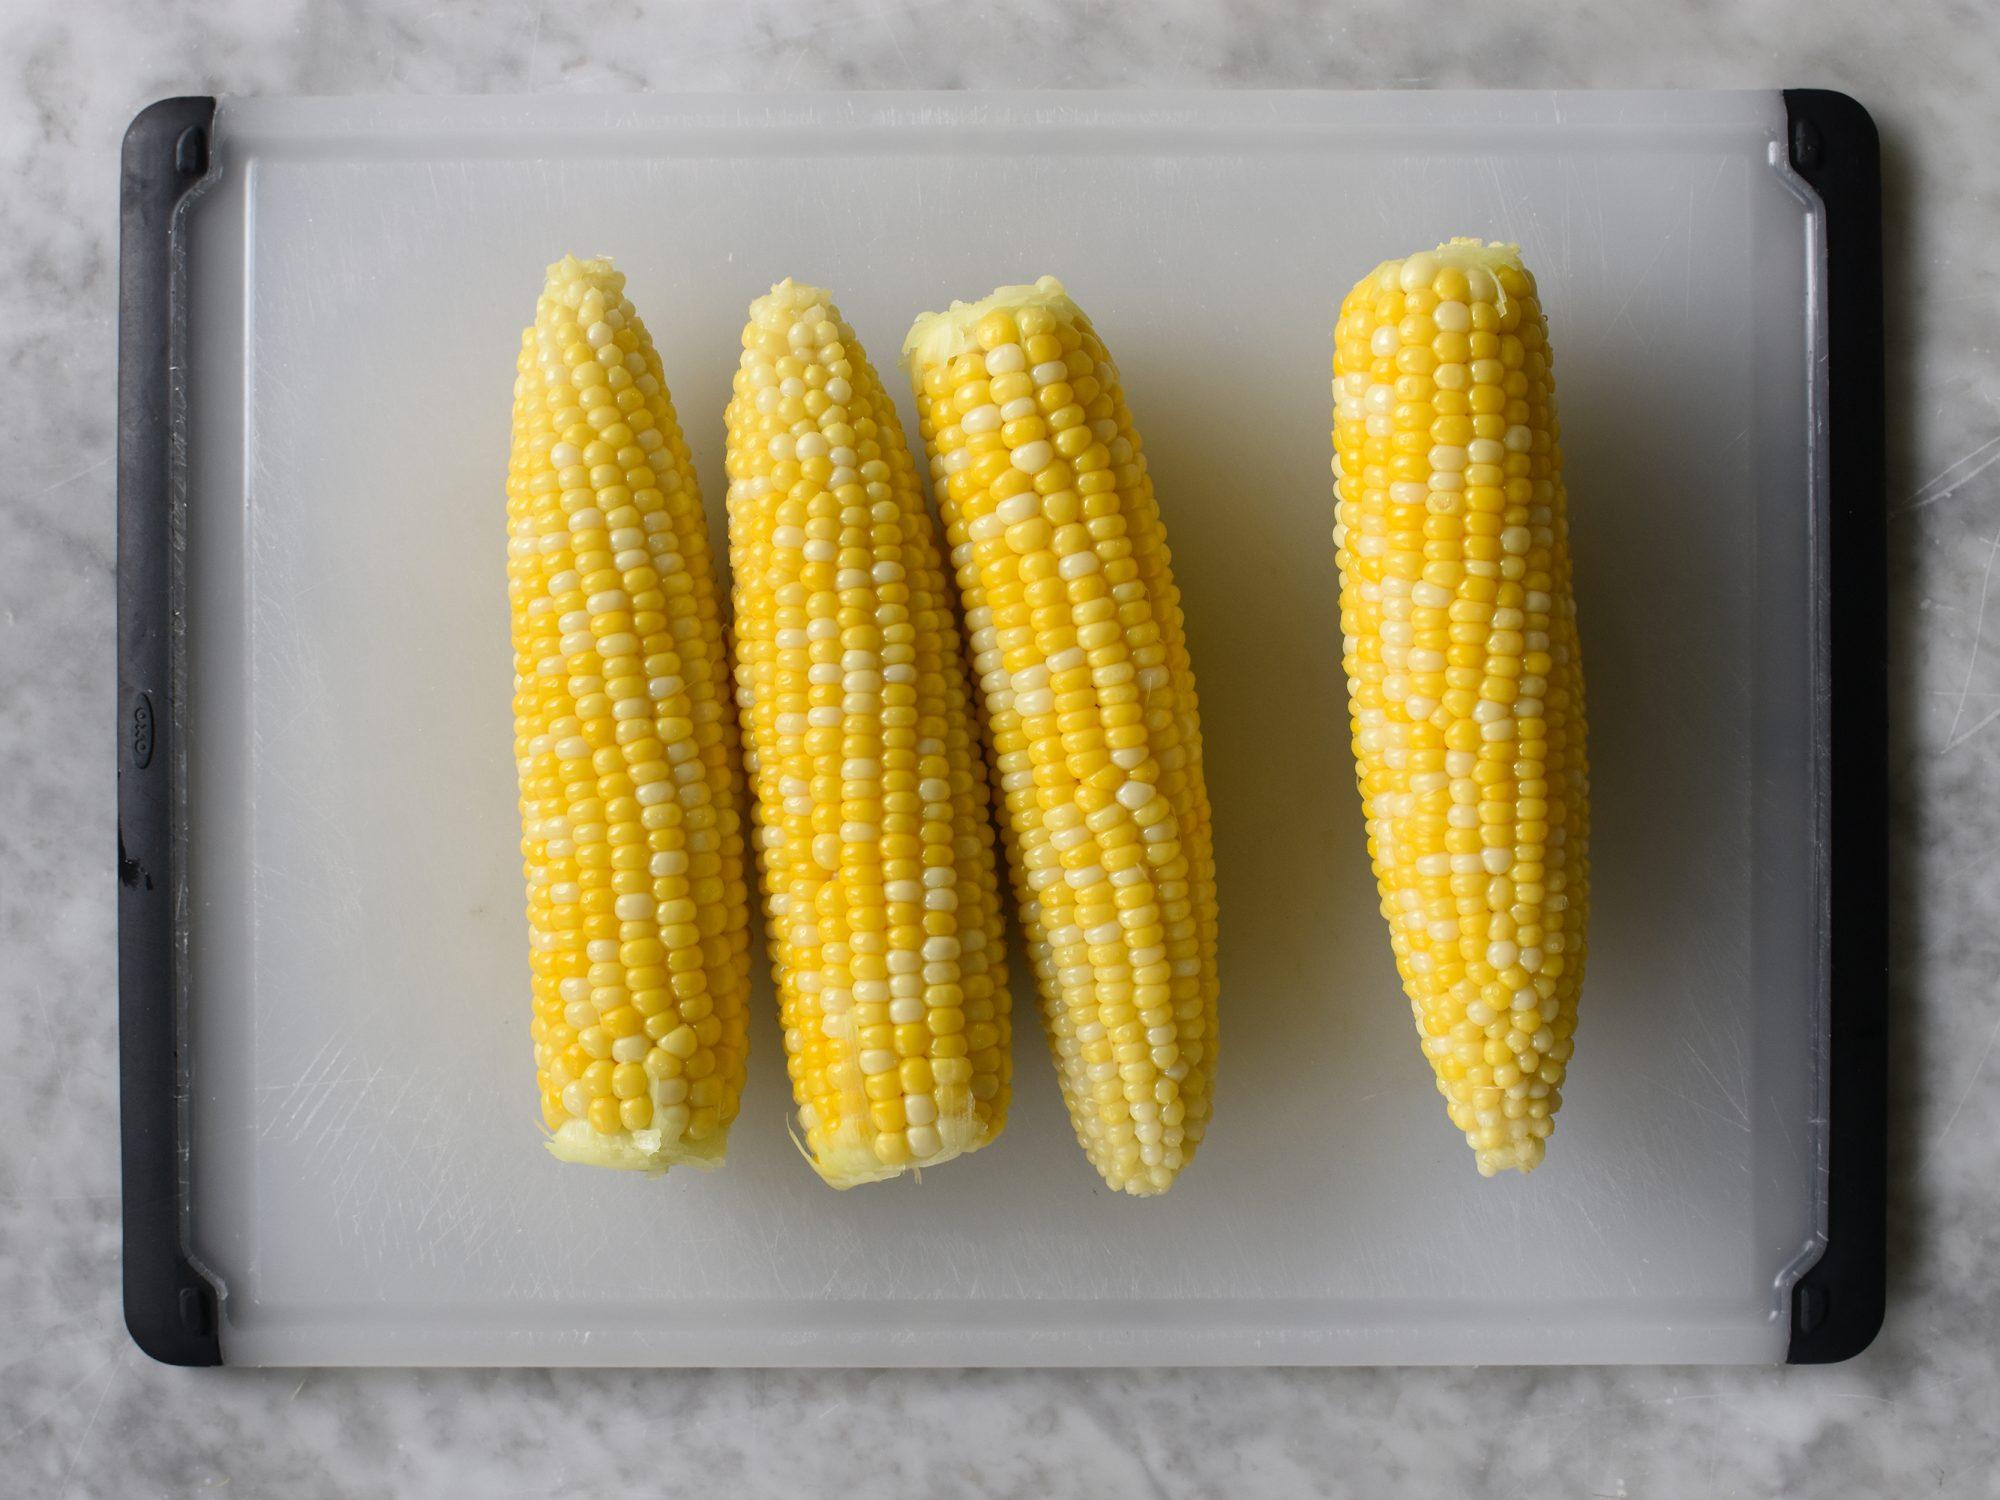 how-to-freeze-corn-on-the-cob-4.jpg